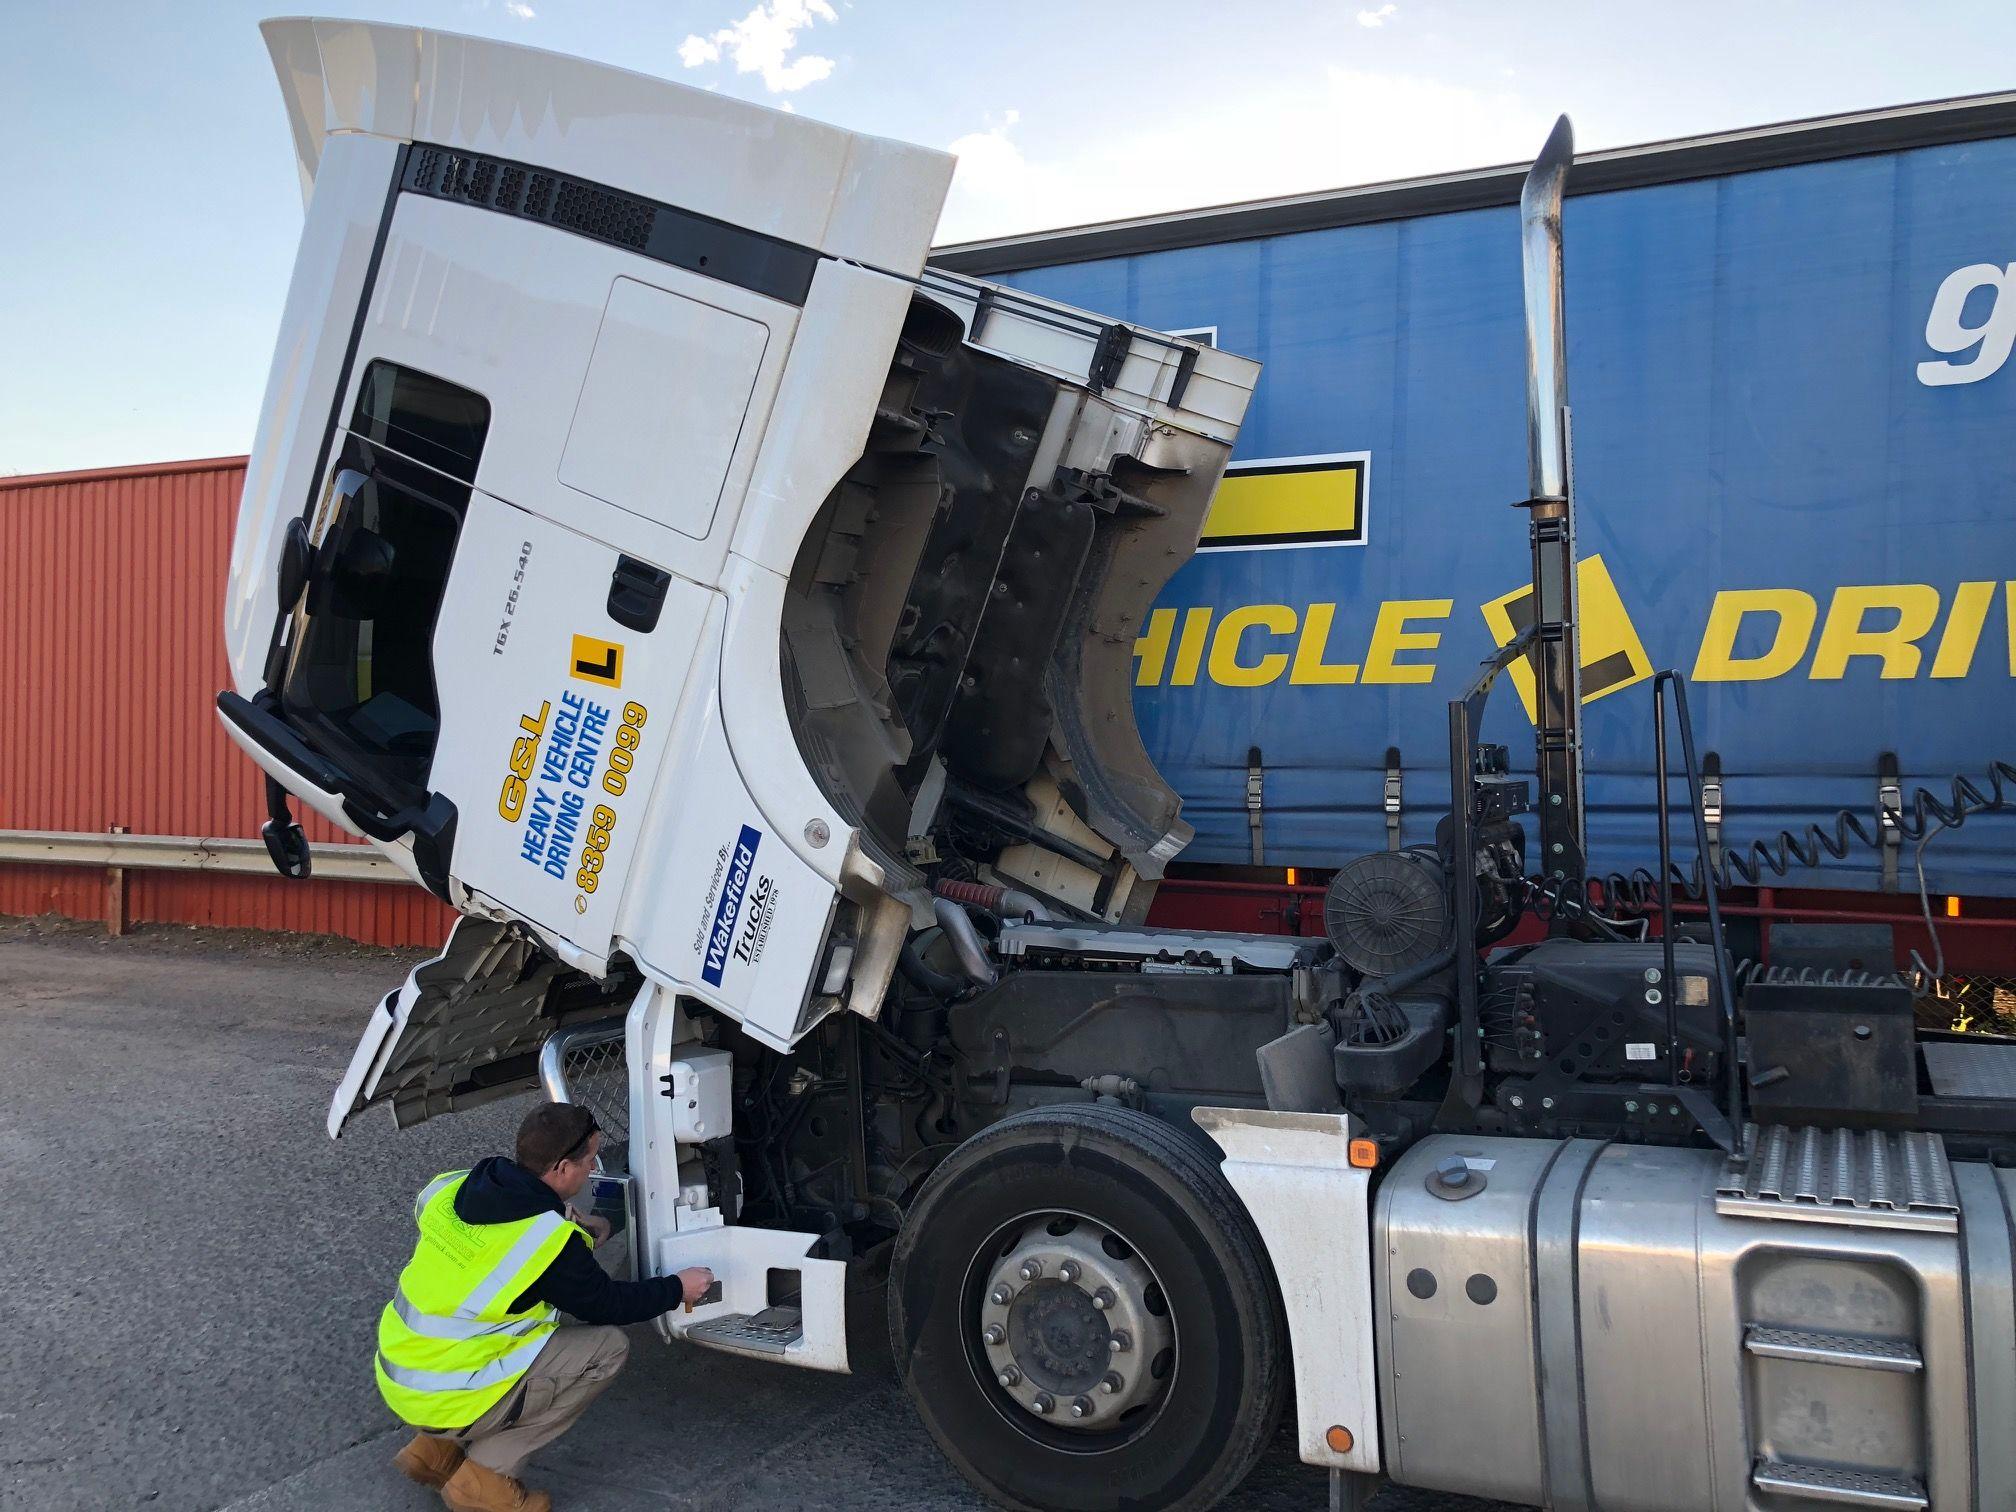 Truck License Adelaide SA,